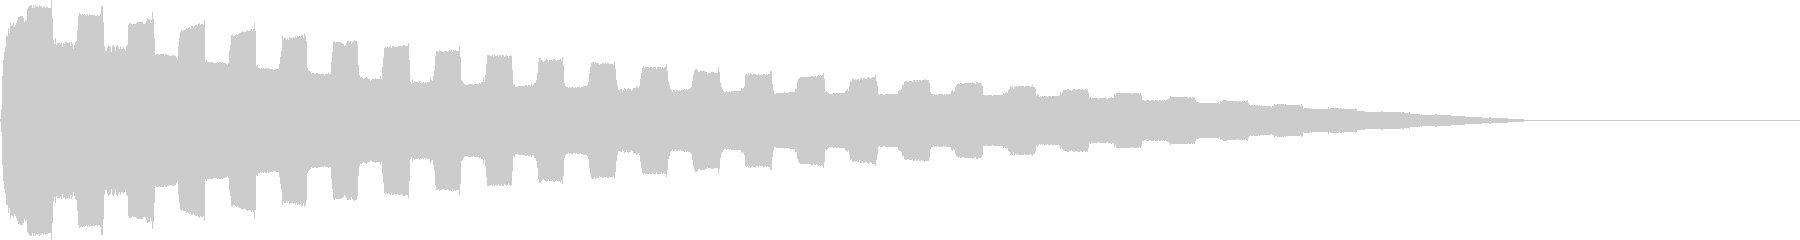 Chip PitchDown 音色N05の未再生の波形